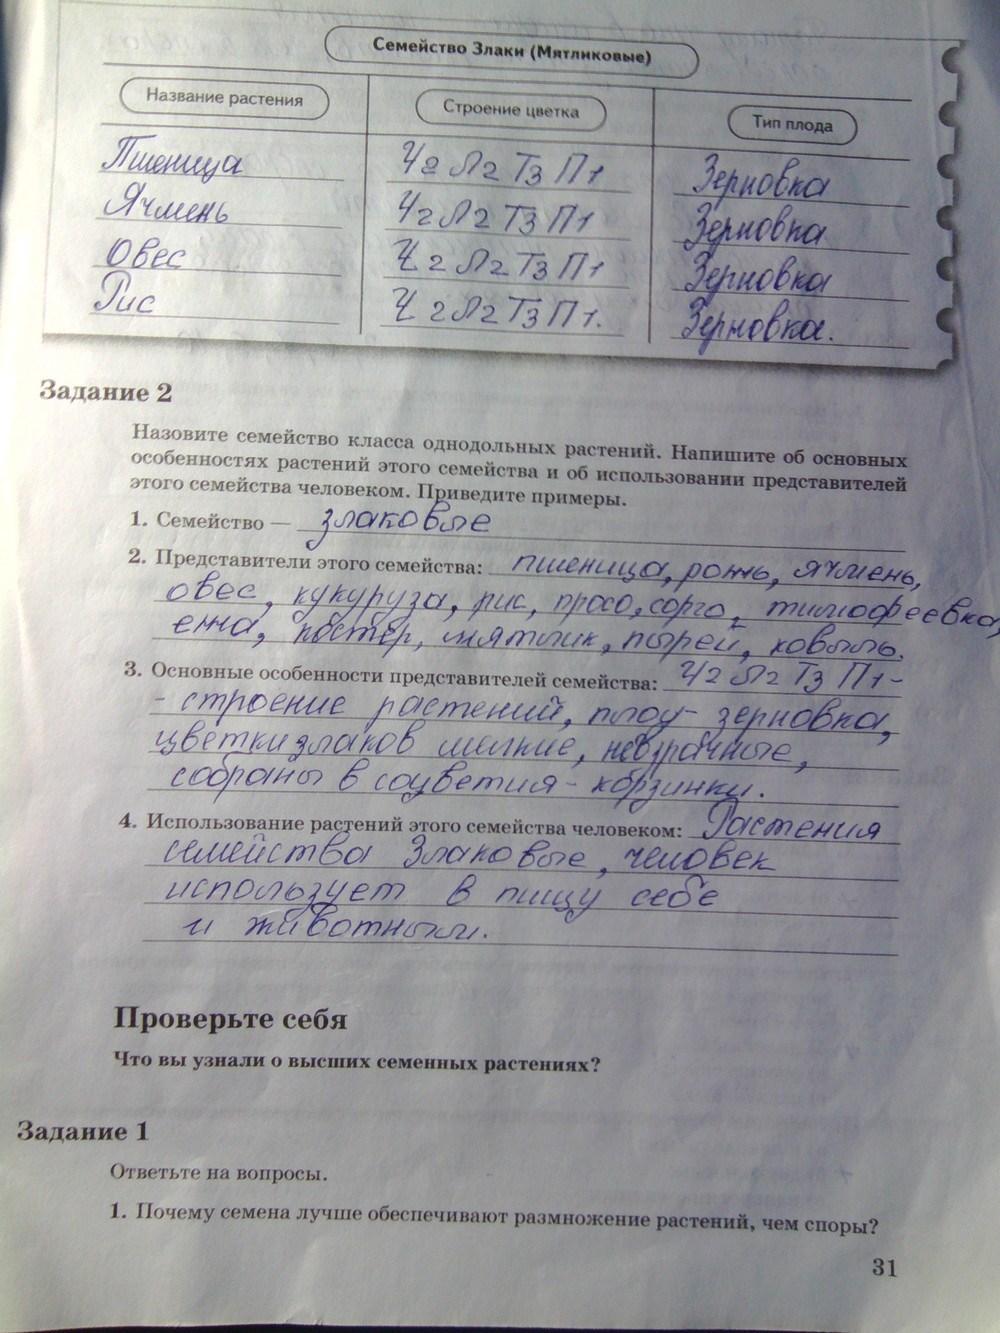 6 пономарева кучменко на биологию корнилова класс гдз